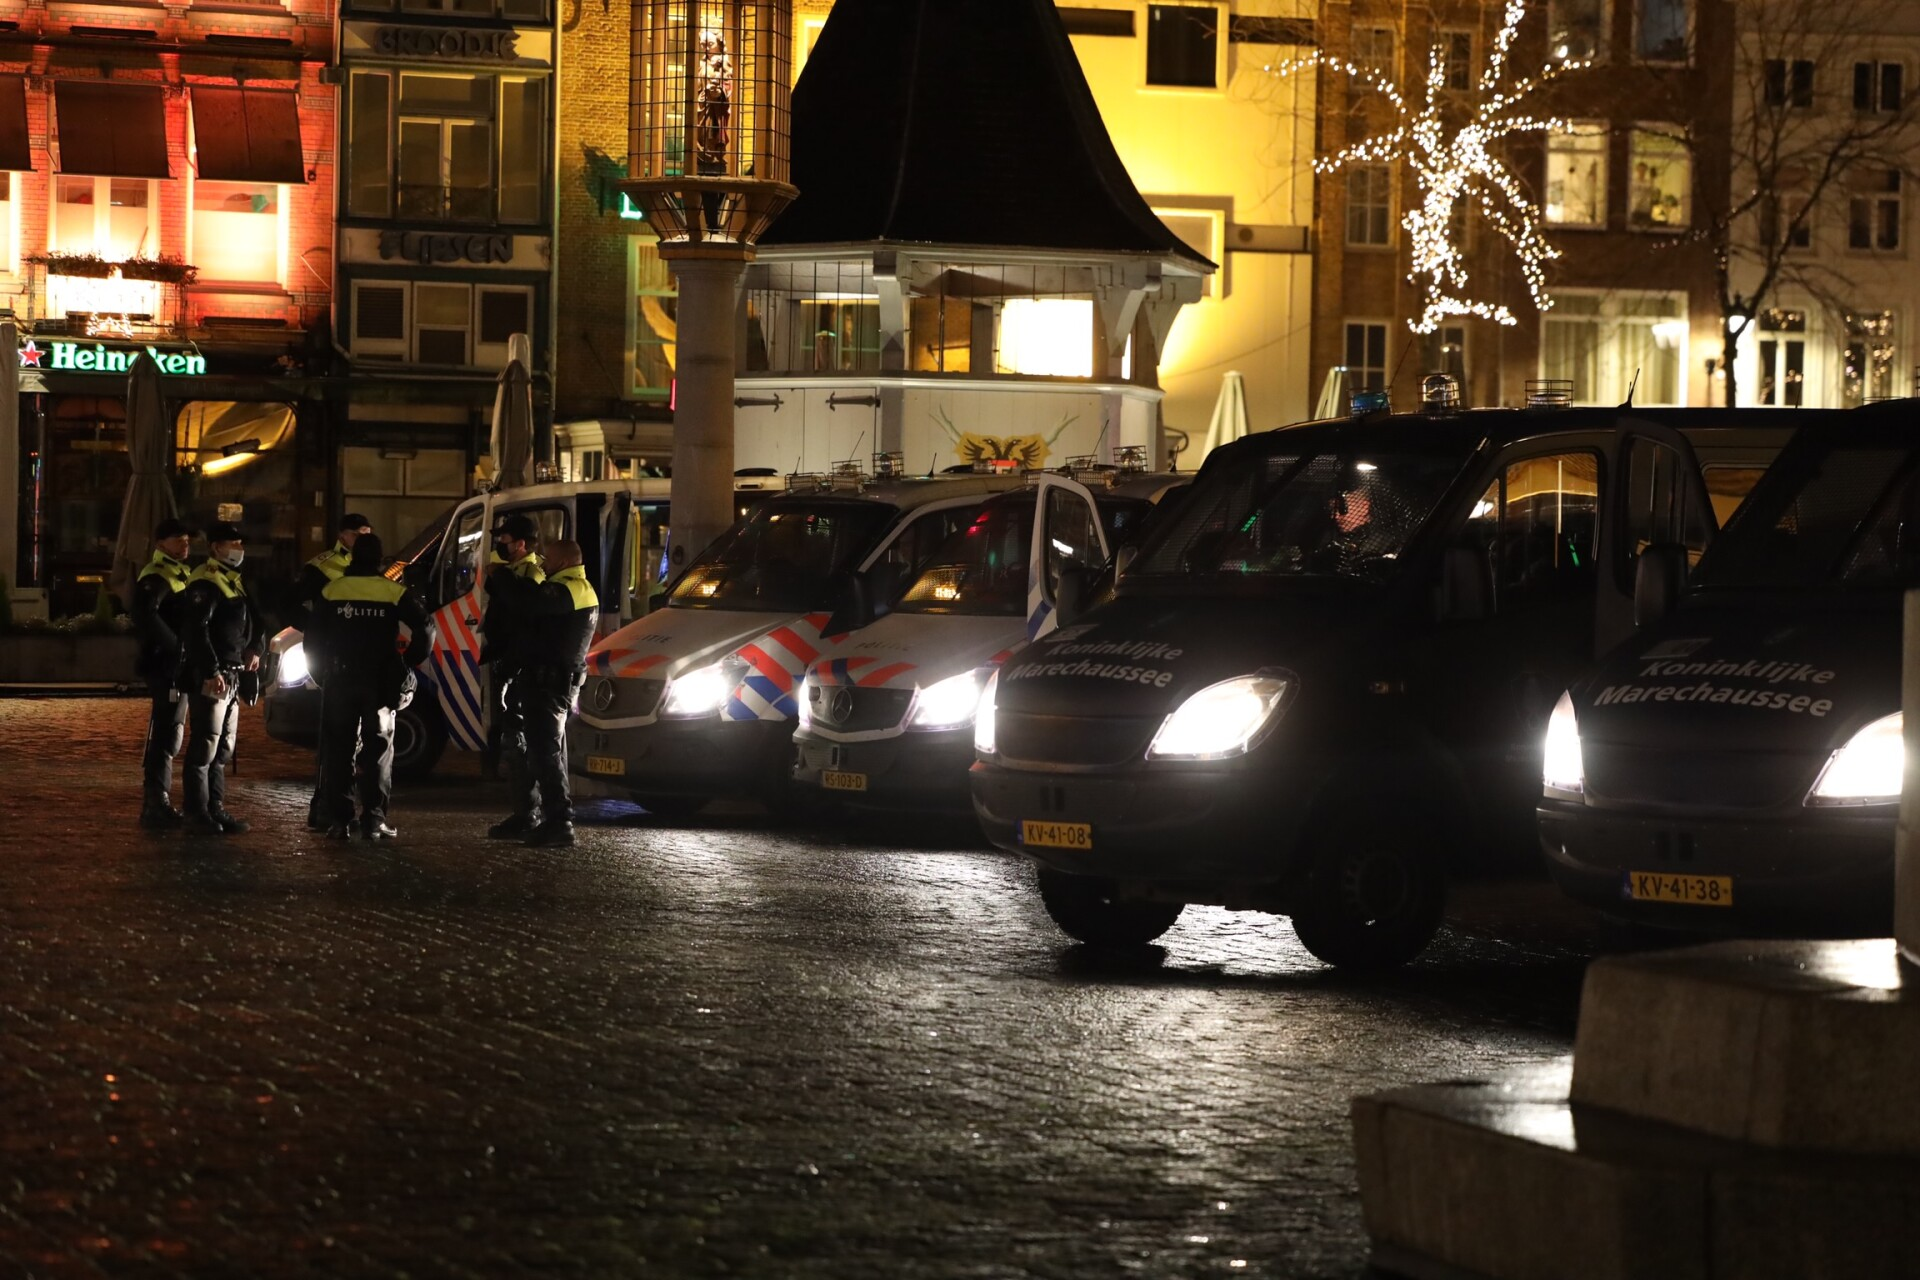 Grote politiemacht in Den Bosch